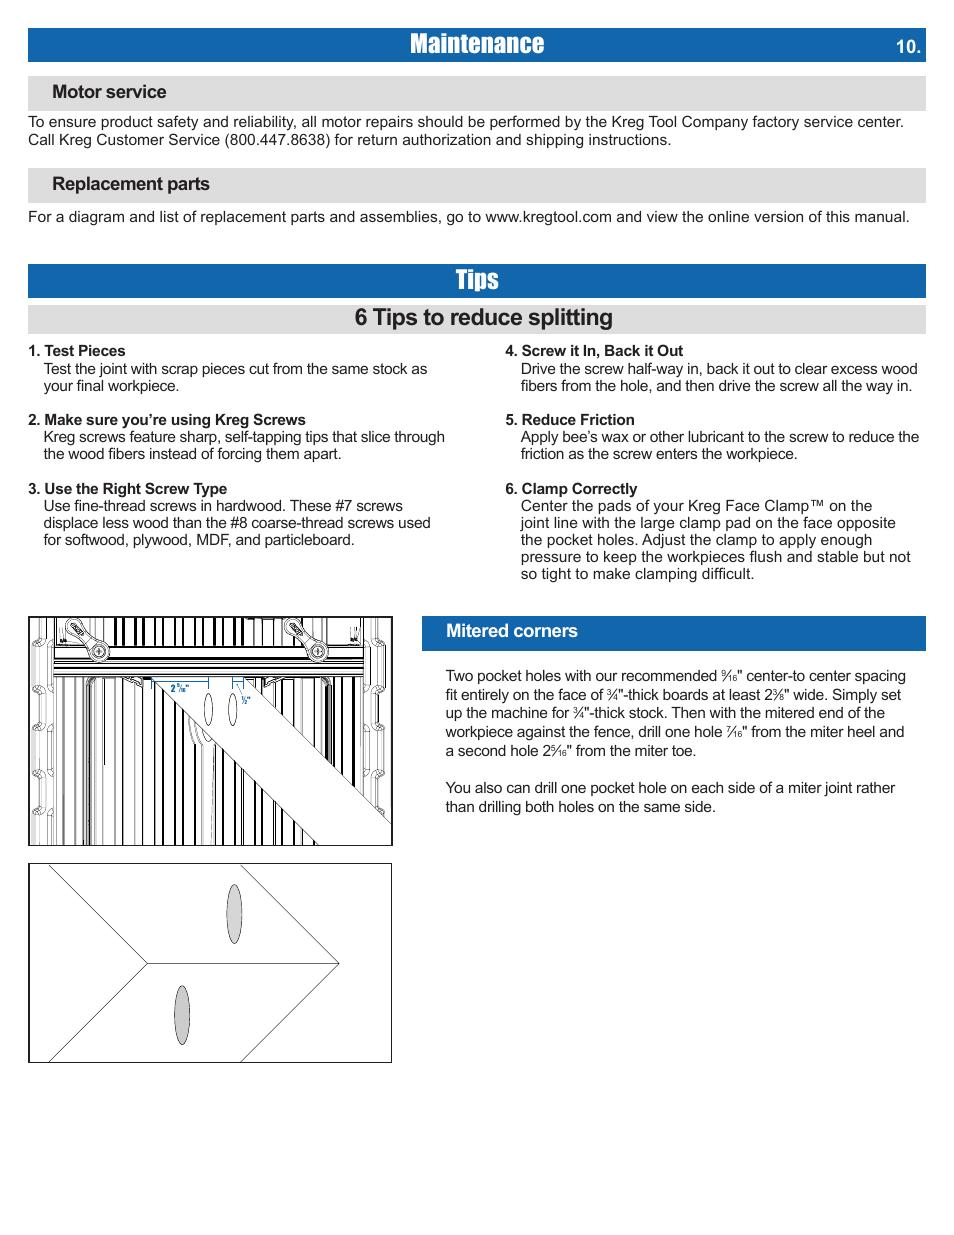 Maintenance, Tips, 6 tips to reduce splitting | Kreg DB210 Foreman